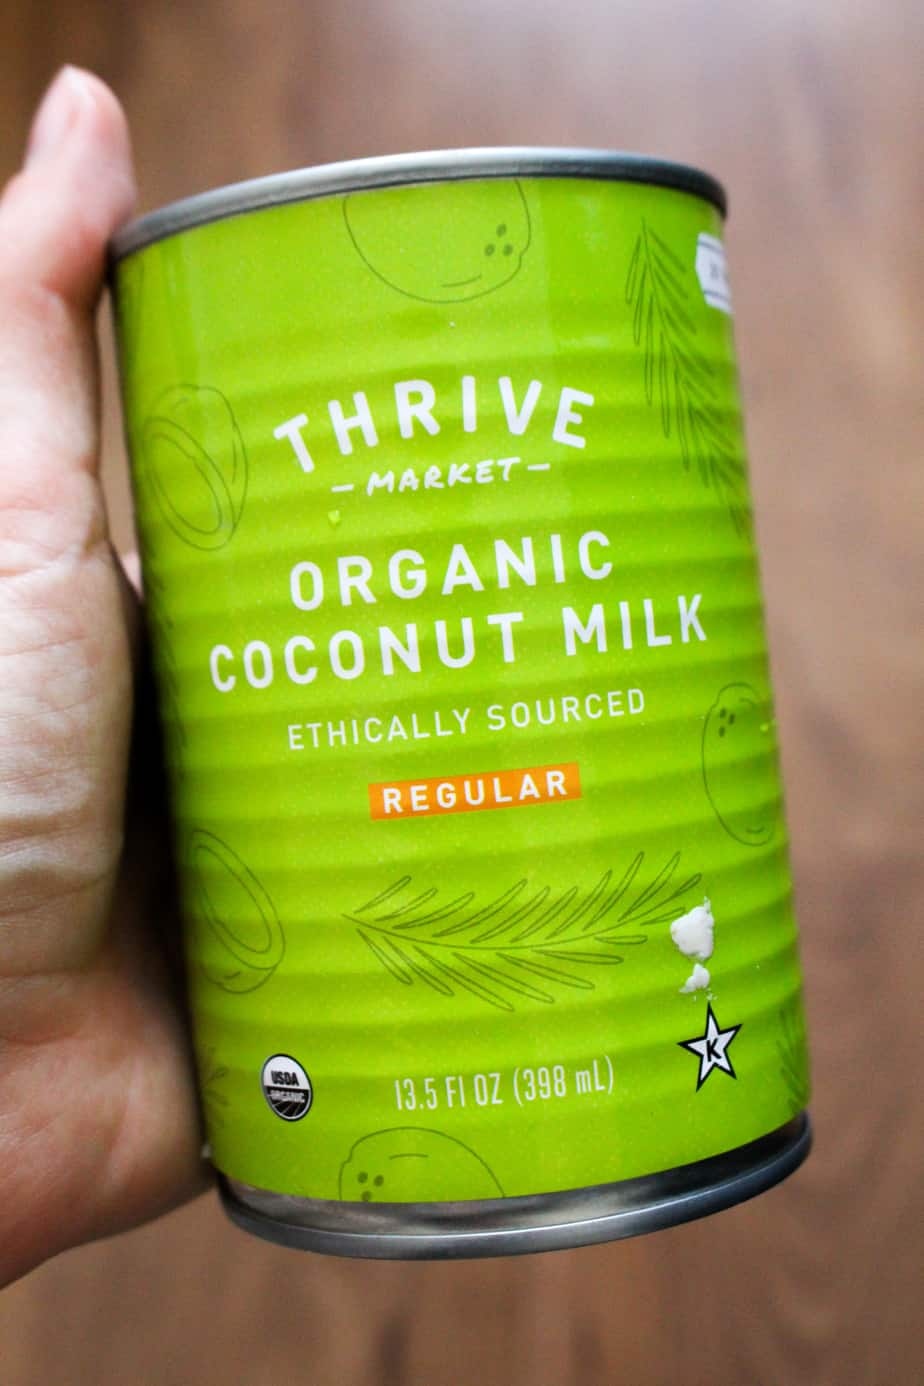 Thrive Market Coconut Milk No Gums | Frugal Nutrition